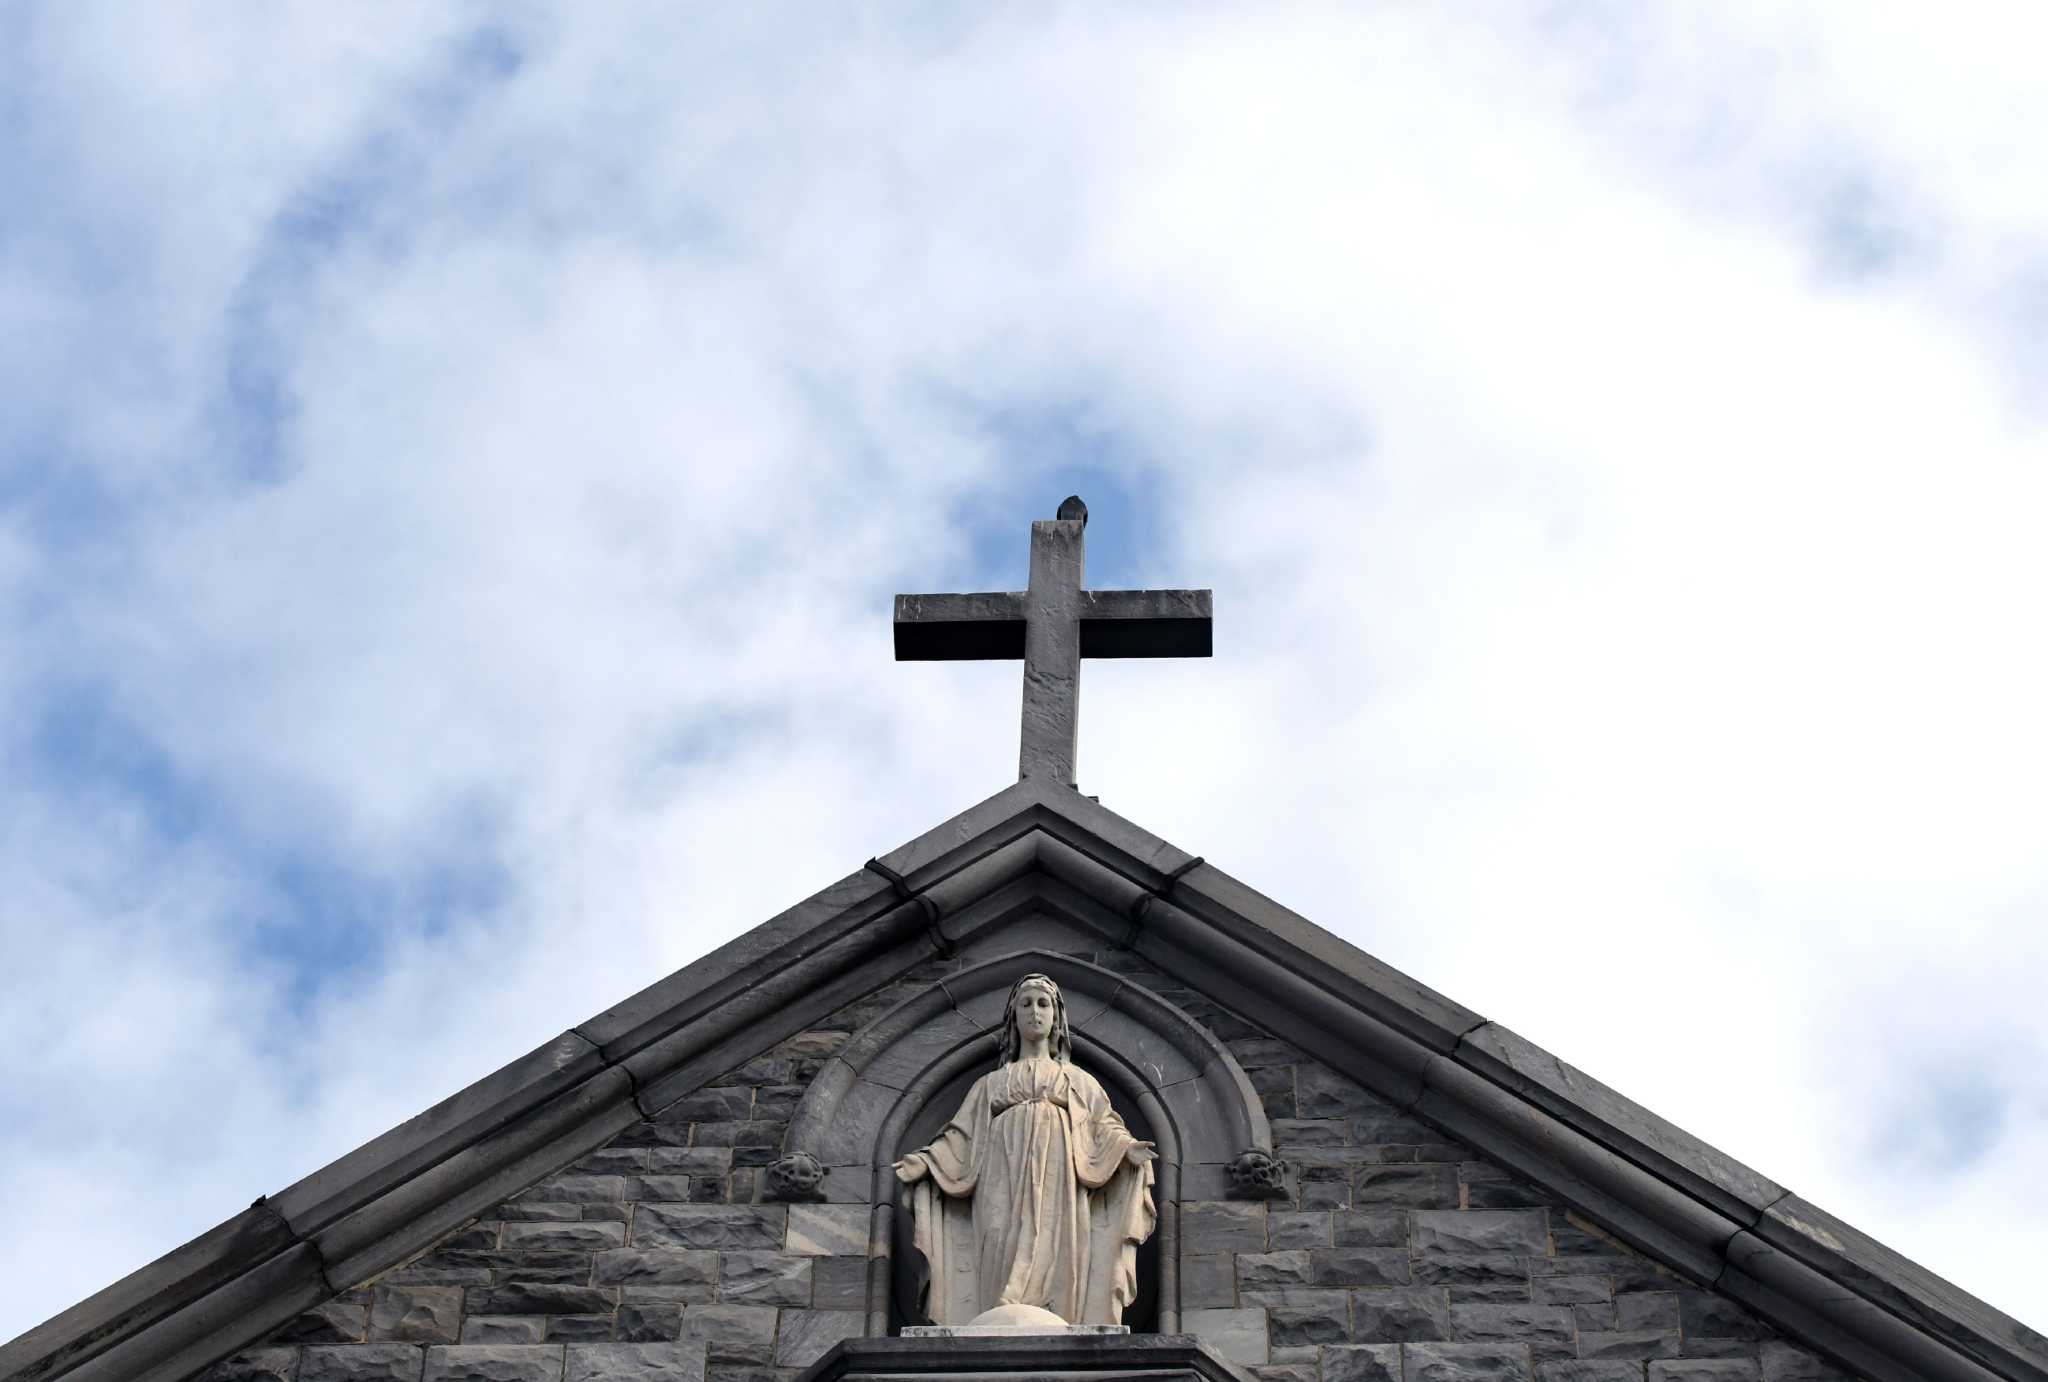 Return to faith needed to help America